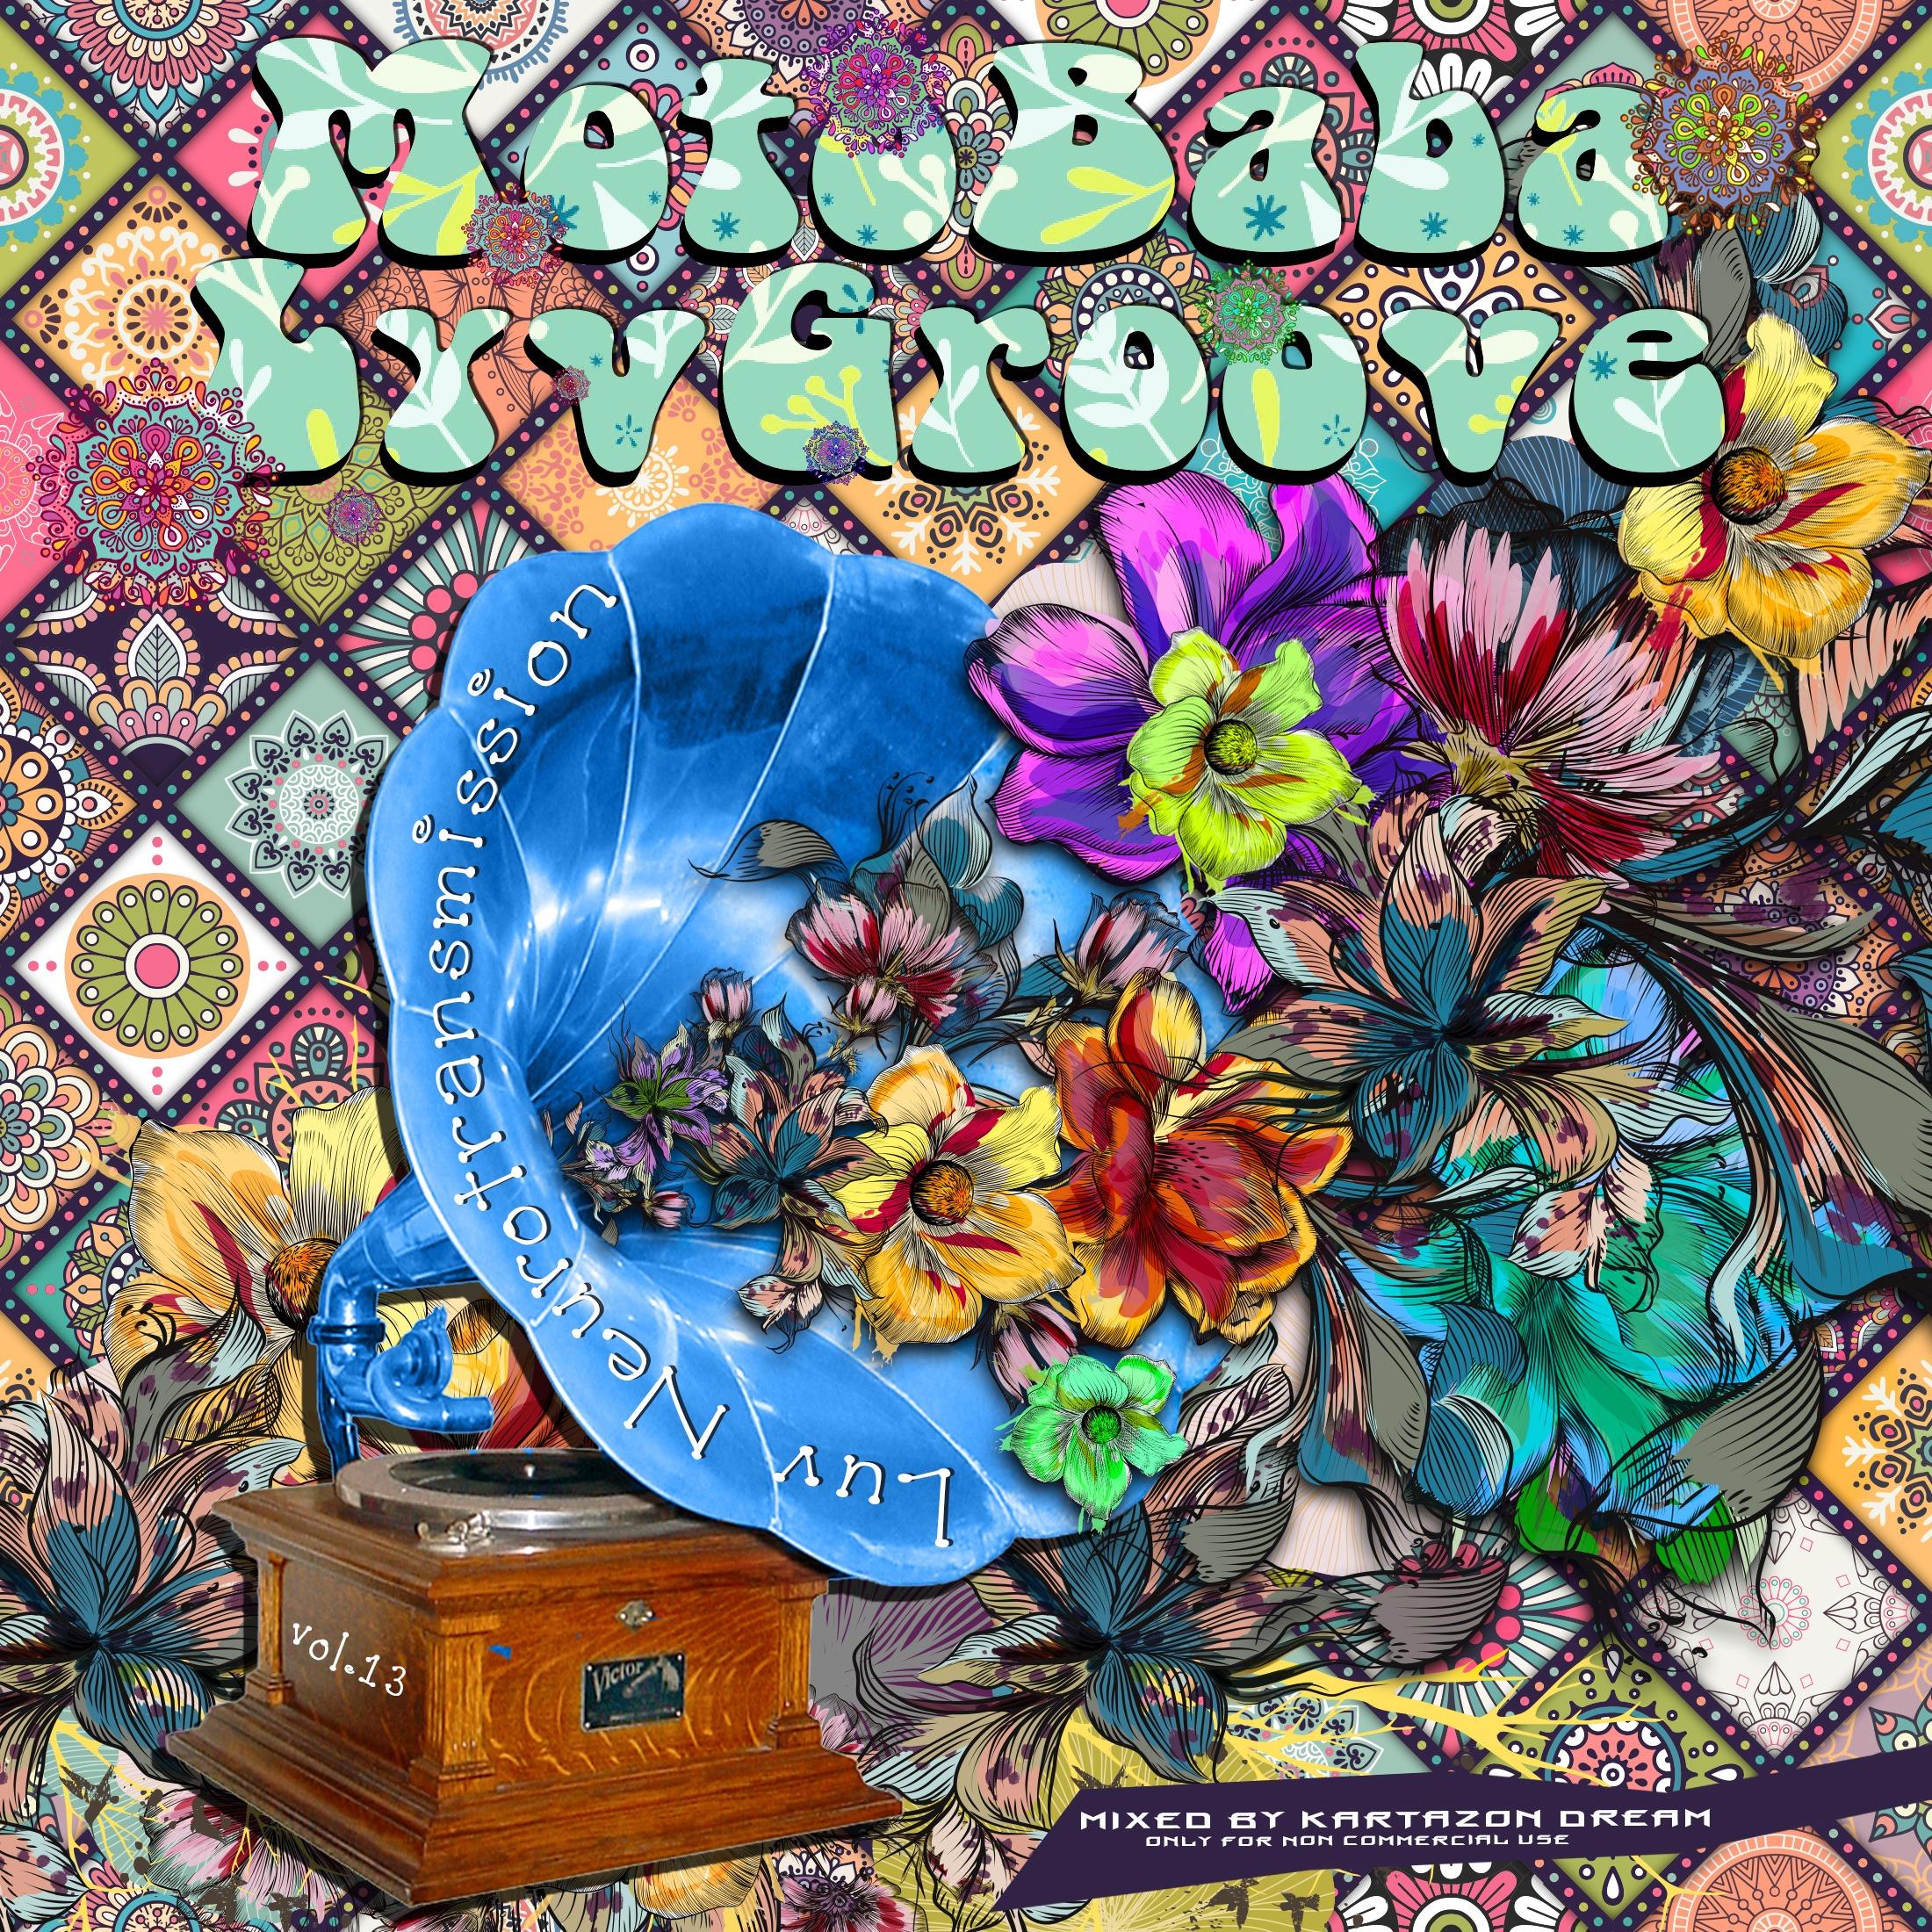 MotoBaba LuvGroove - Vol.13 Luv Neurotransmission. Авторские сборники музыки 60-х и 70-х, прогрока и прогфолка